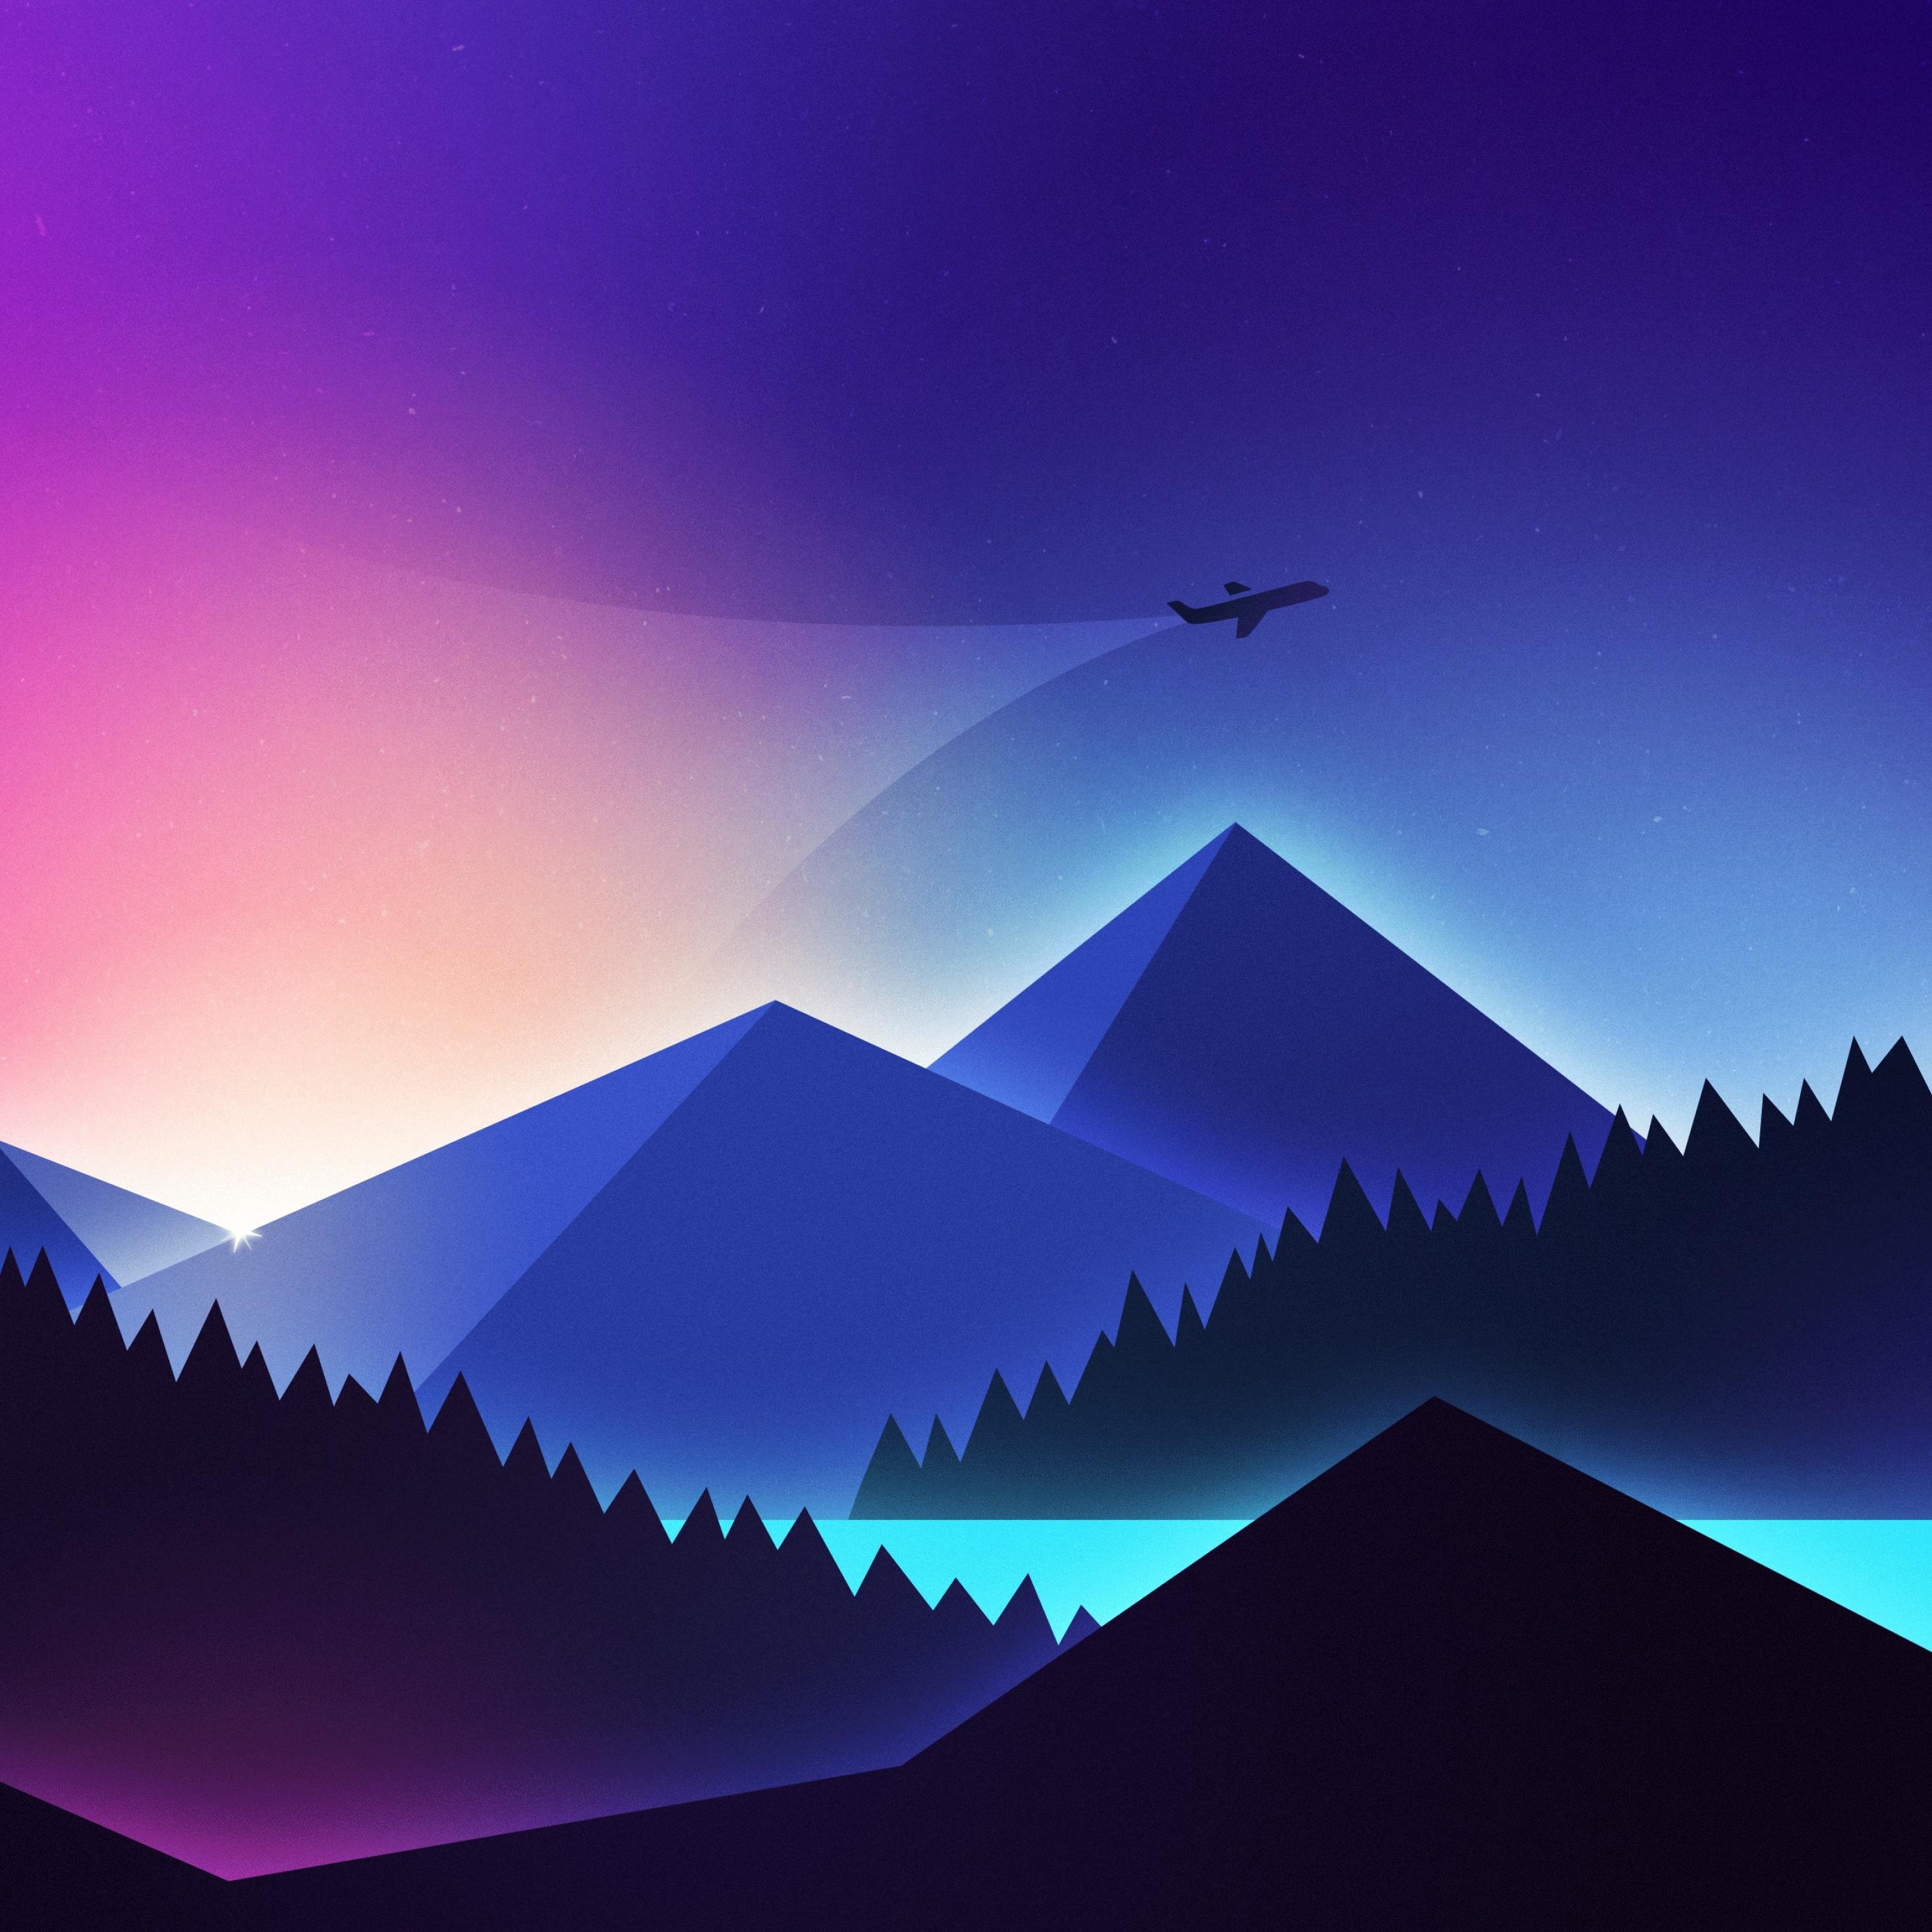 Airplane Minimal Gradient, HD 4K Wallpaper